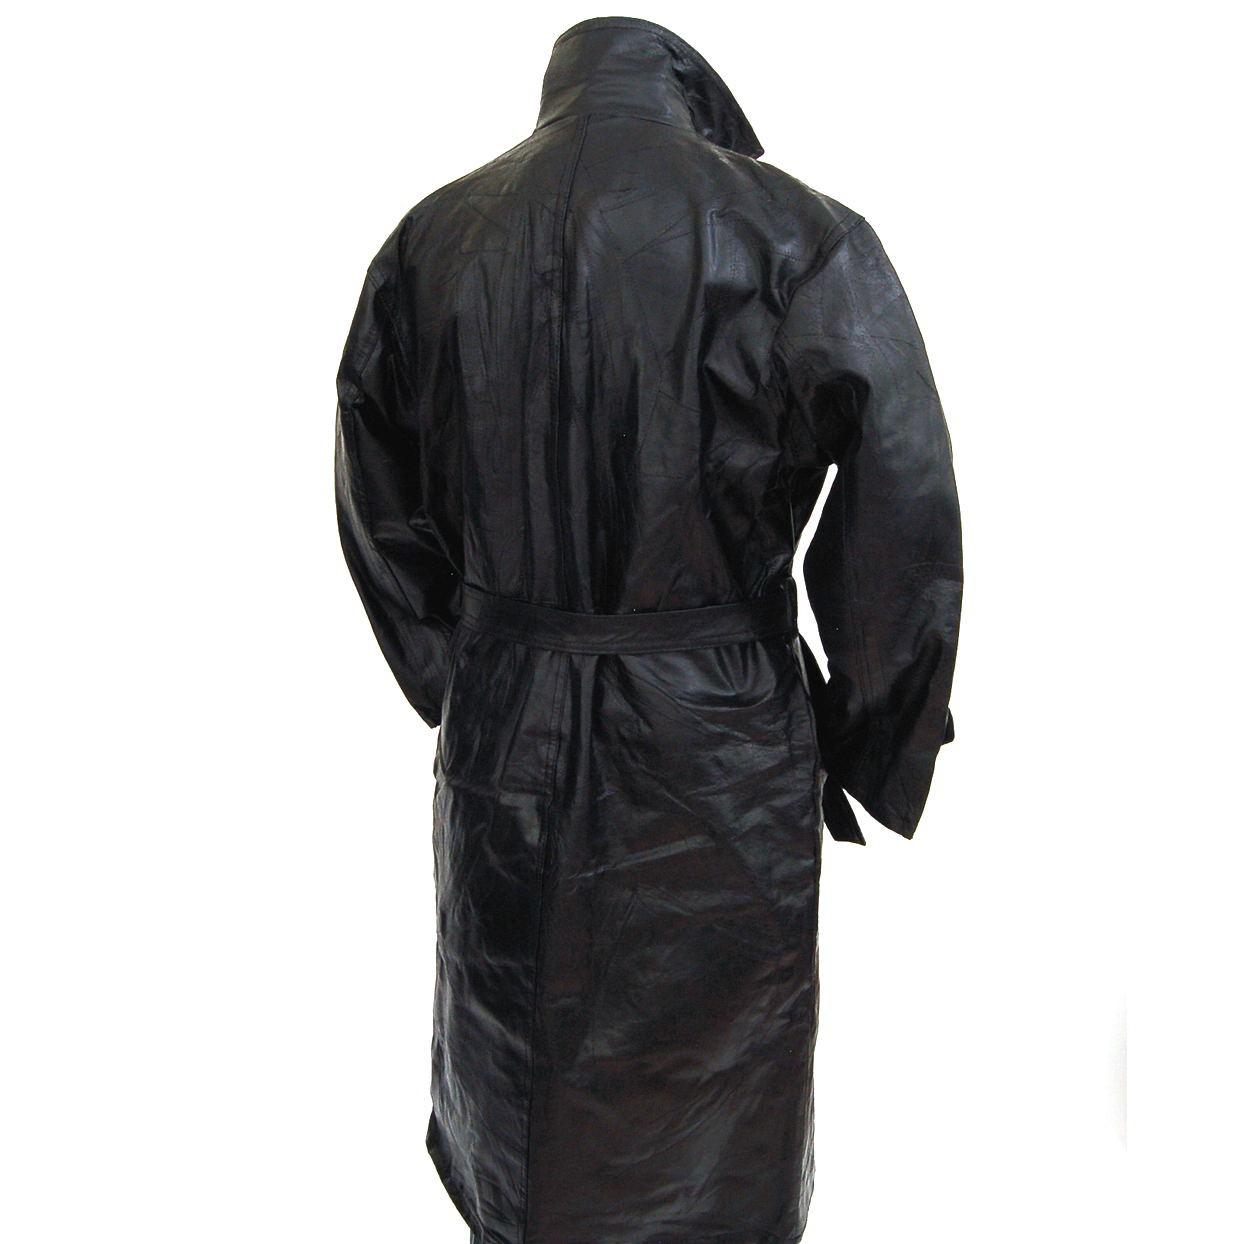 Longer length leather jacket